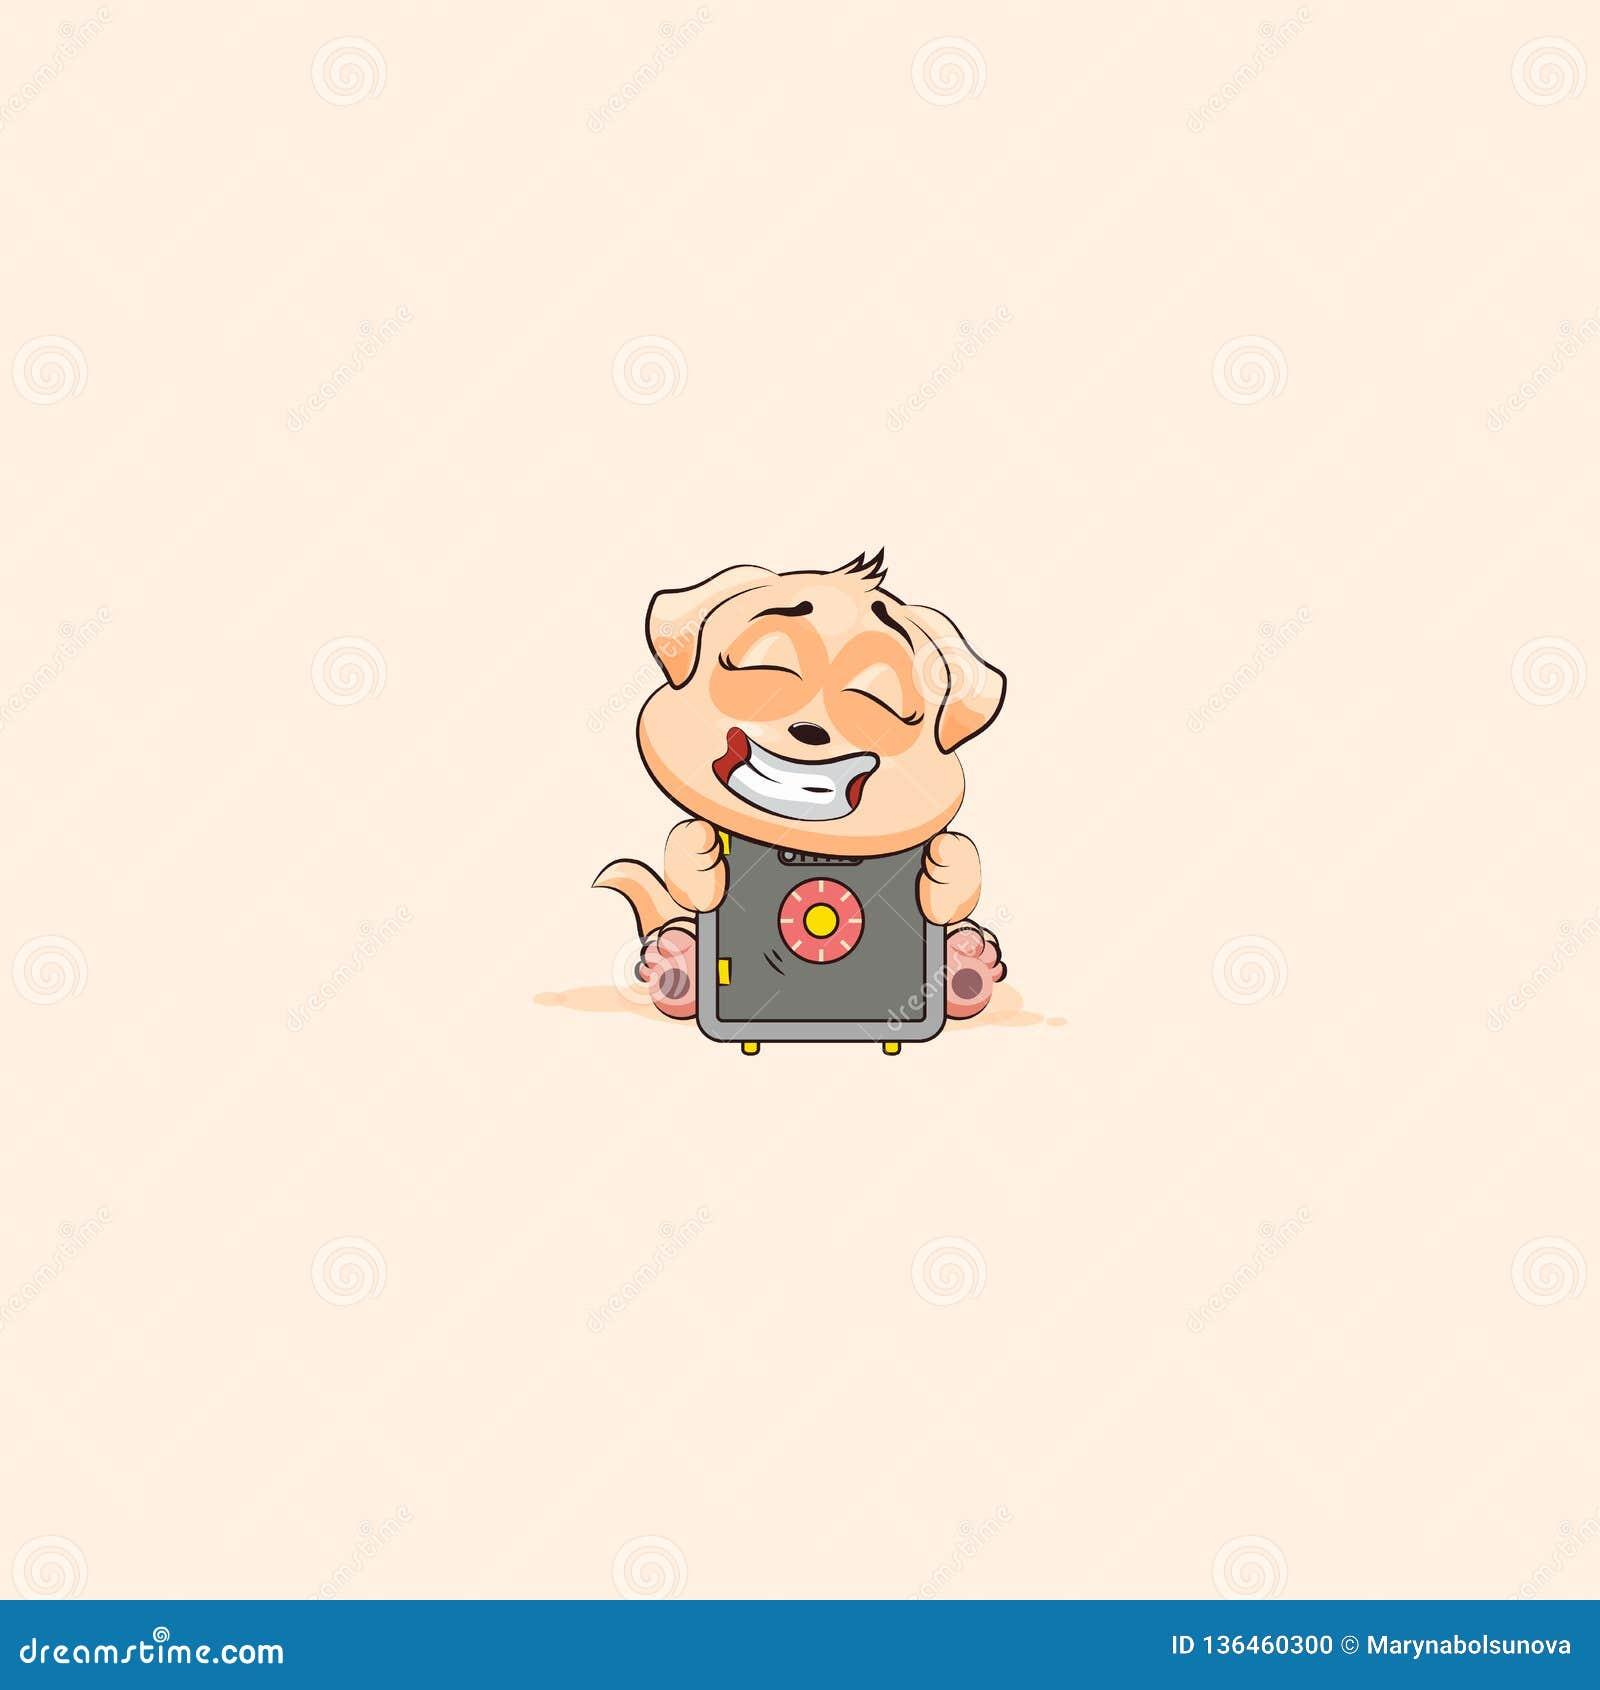 Dog Cub Sticker Emoticon Hug Safe With Money Stock Vector